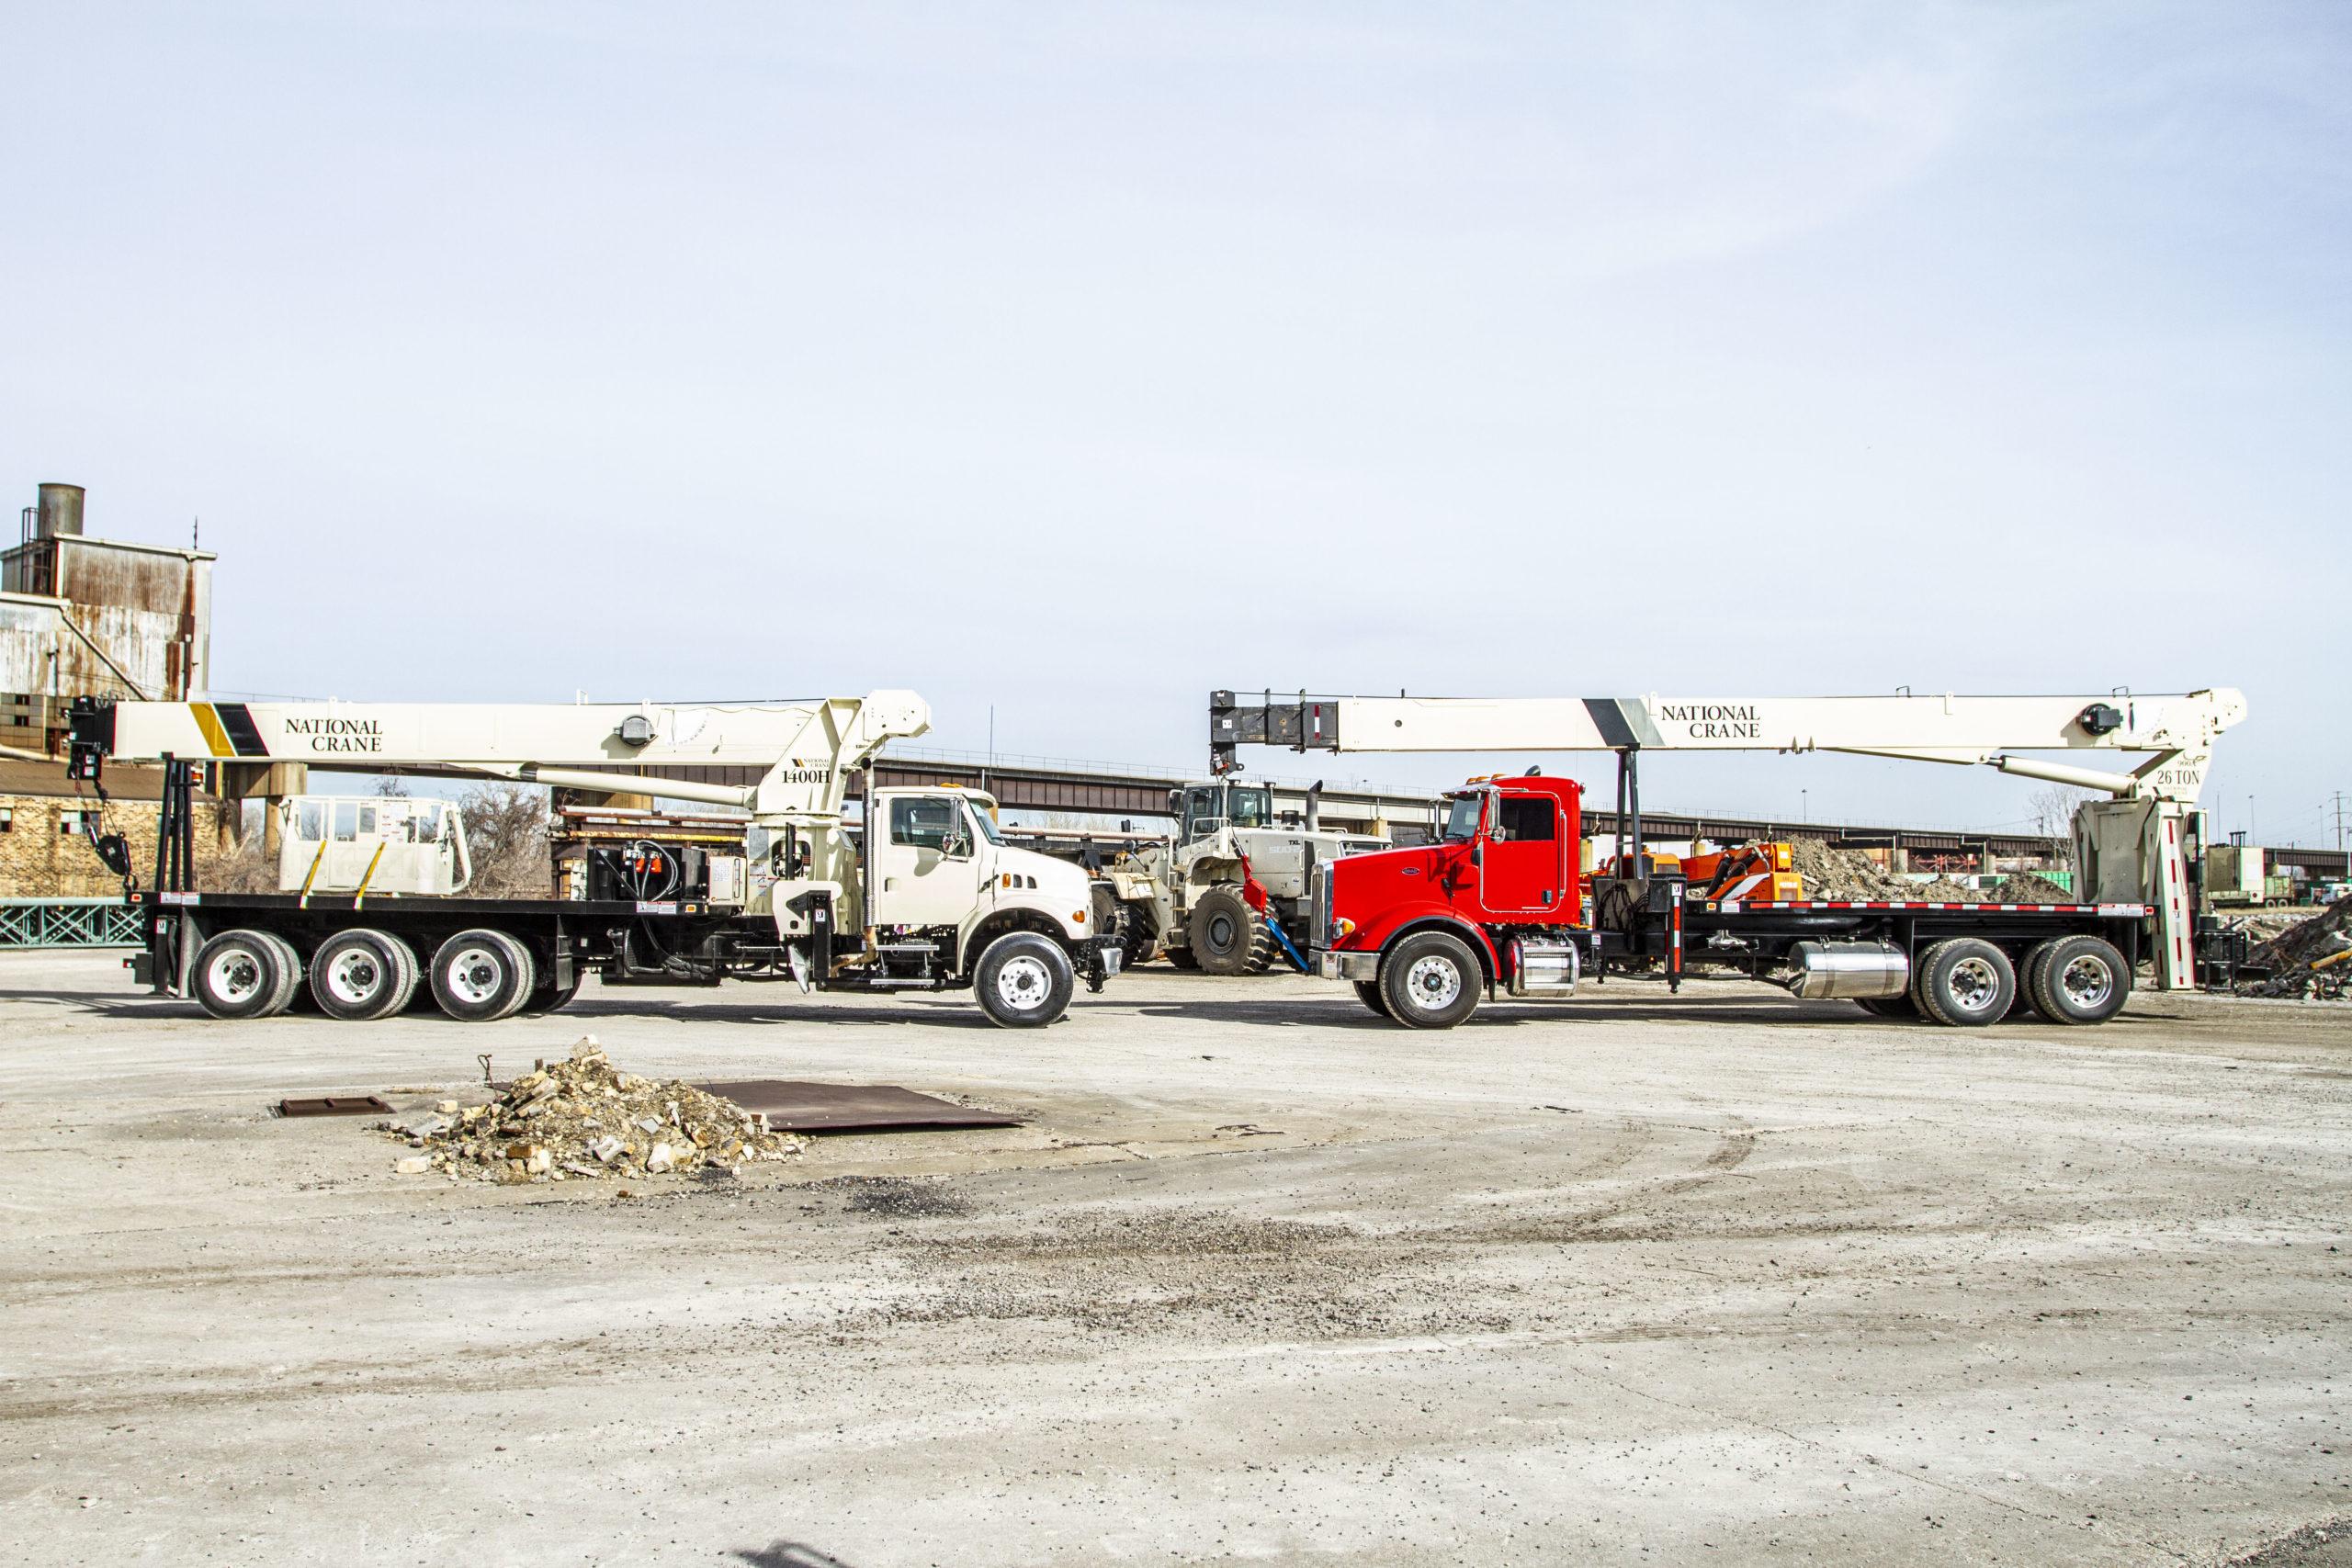 used equipment, two crane trucks